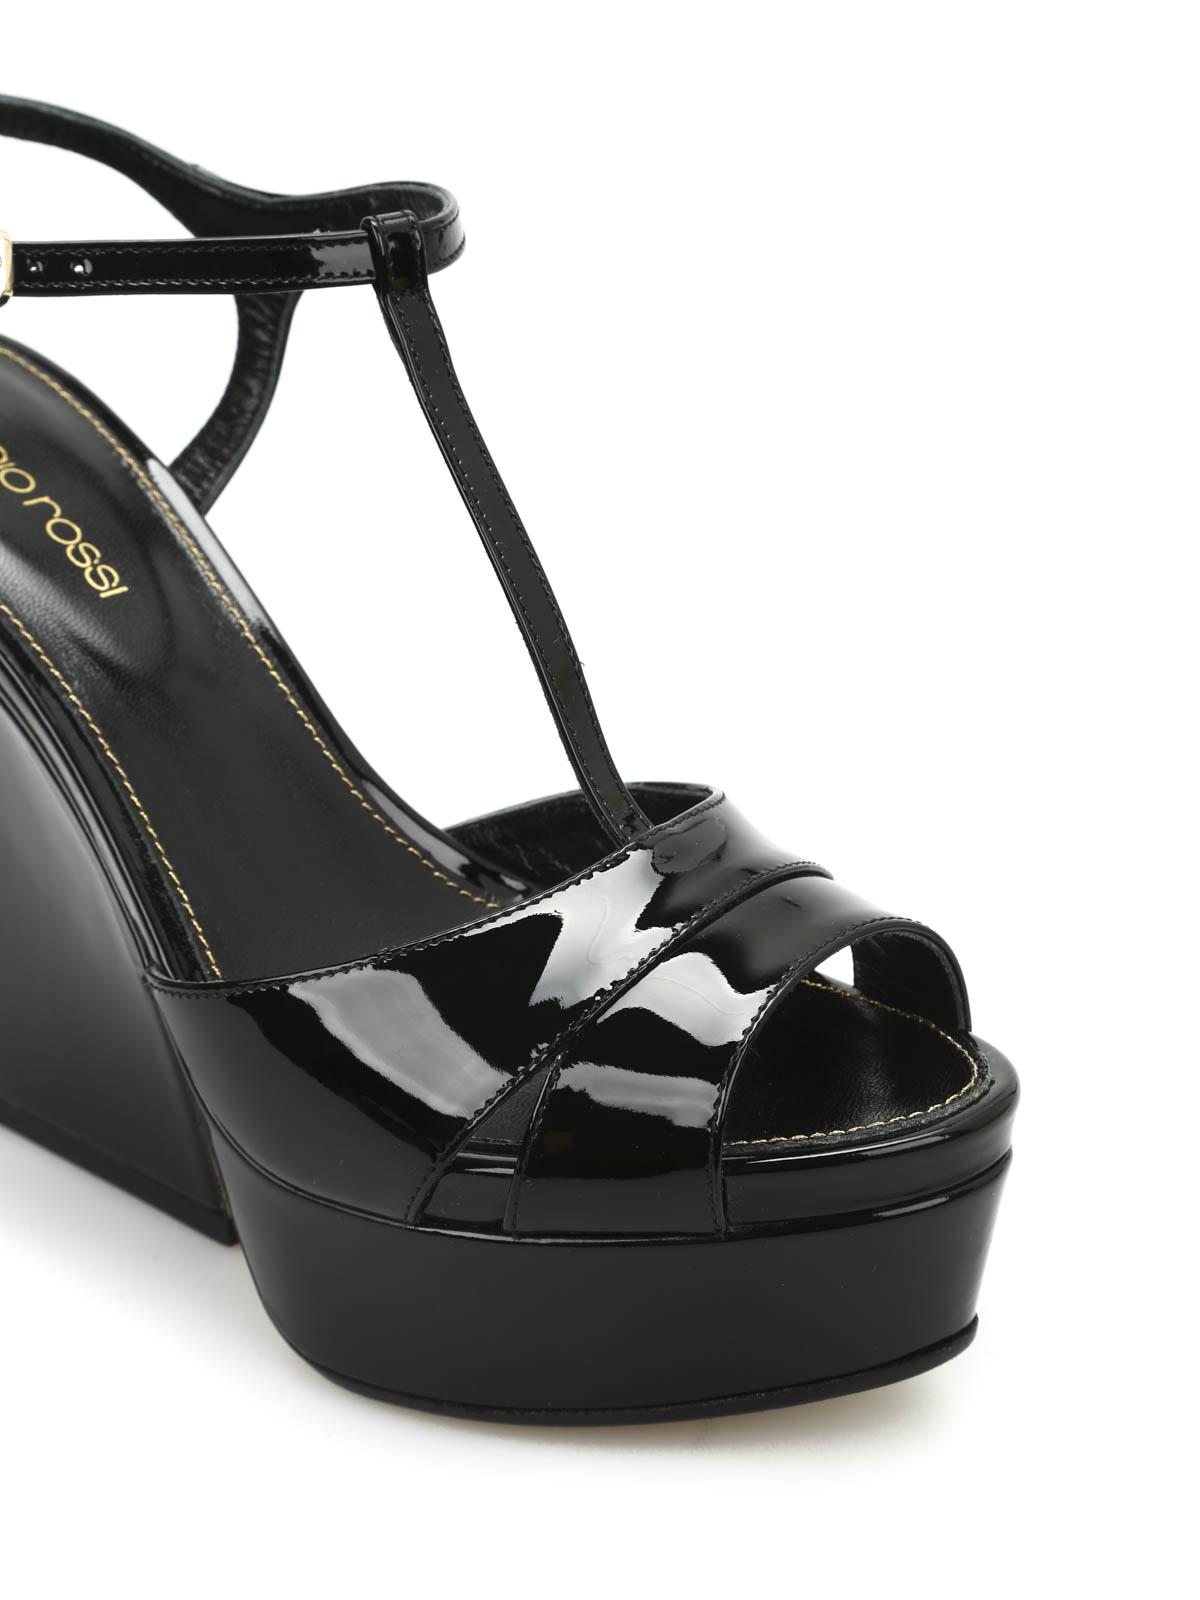 edwige sandals by sergio rossi sandals ikrix. Black Bedroom Furniture Sets. Home Design Ideas